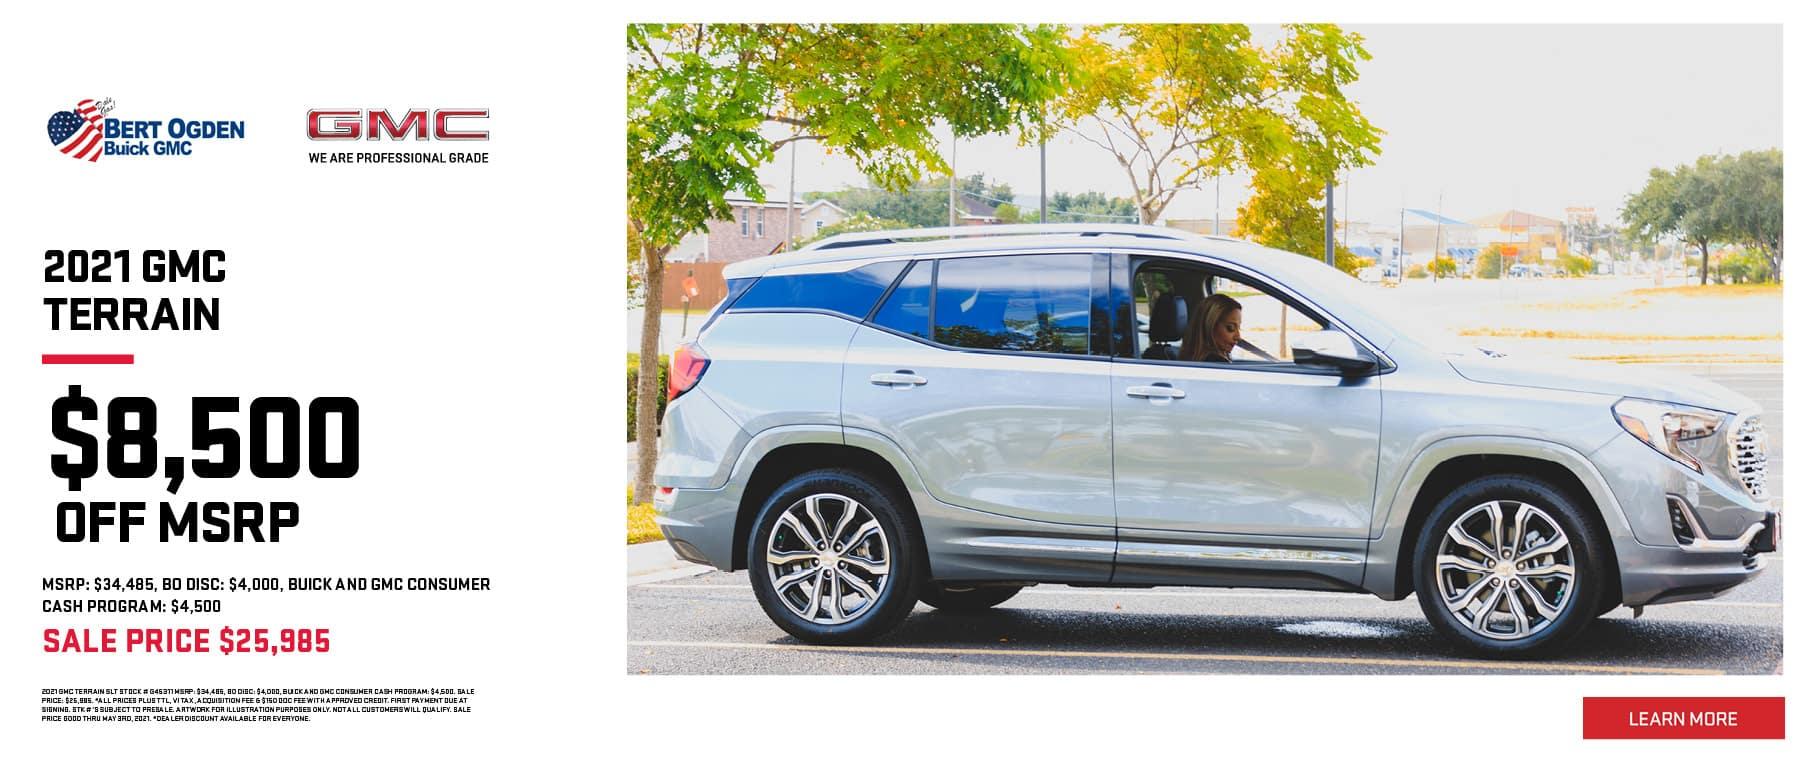 2021 GMC Terrain | Bert Ogden Buick GMC | Edinburg, TX